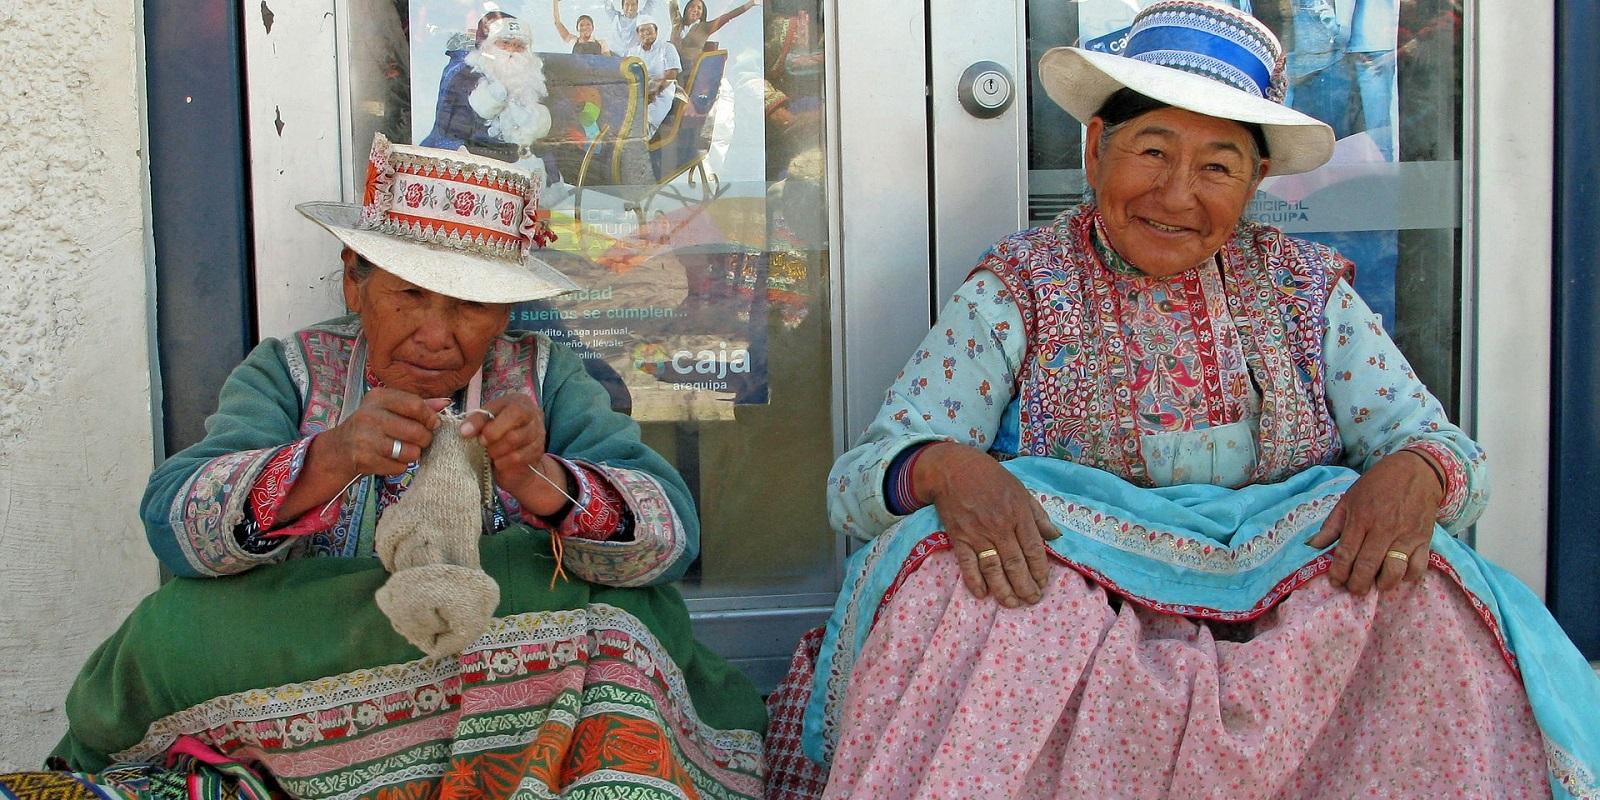 Perù, due donne ad Arequipa